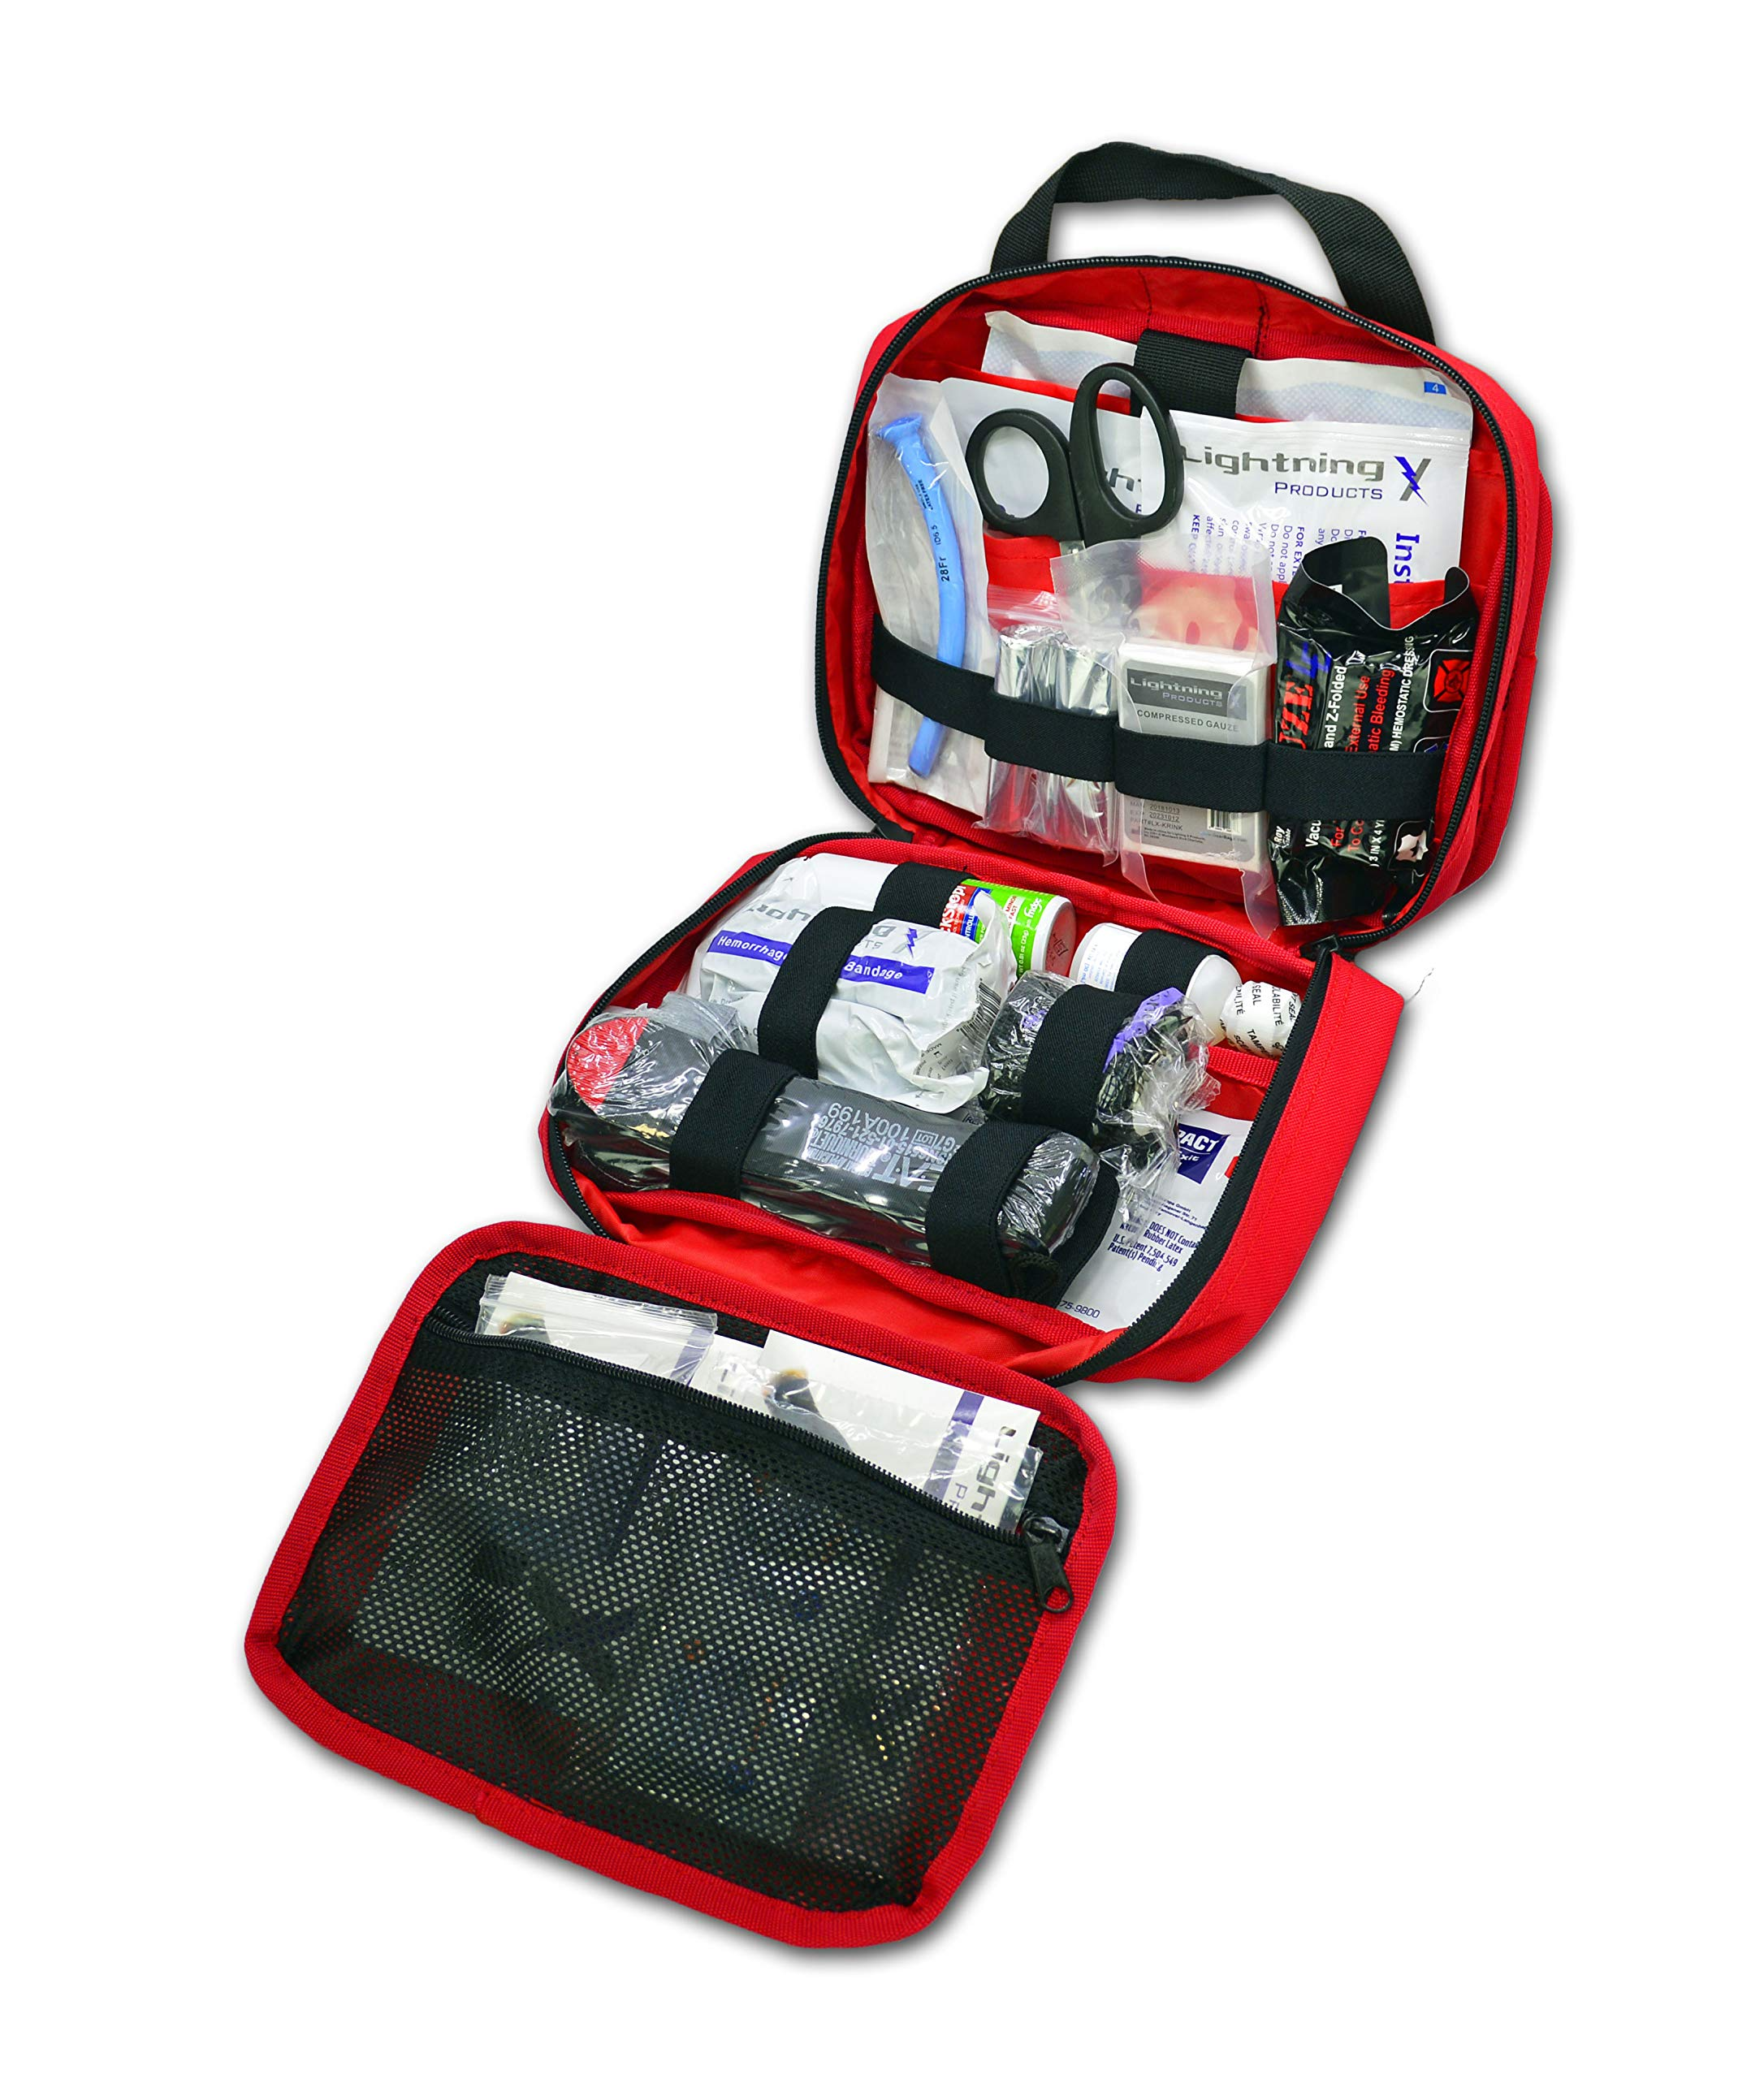 Lightning X Rip-Away Officer's Patrol Tactical Gunshot & Trauma IFAK Kit w/Headrest Mount - RED by Lightning X Products